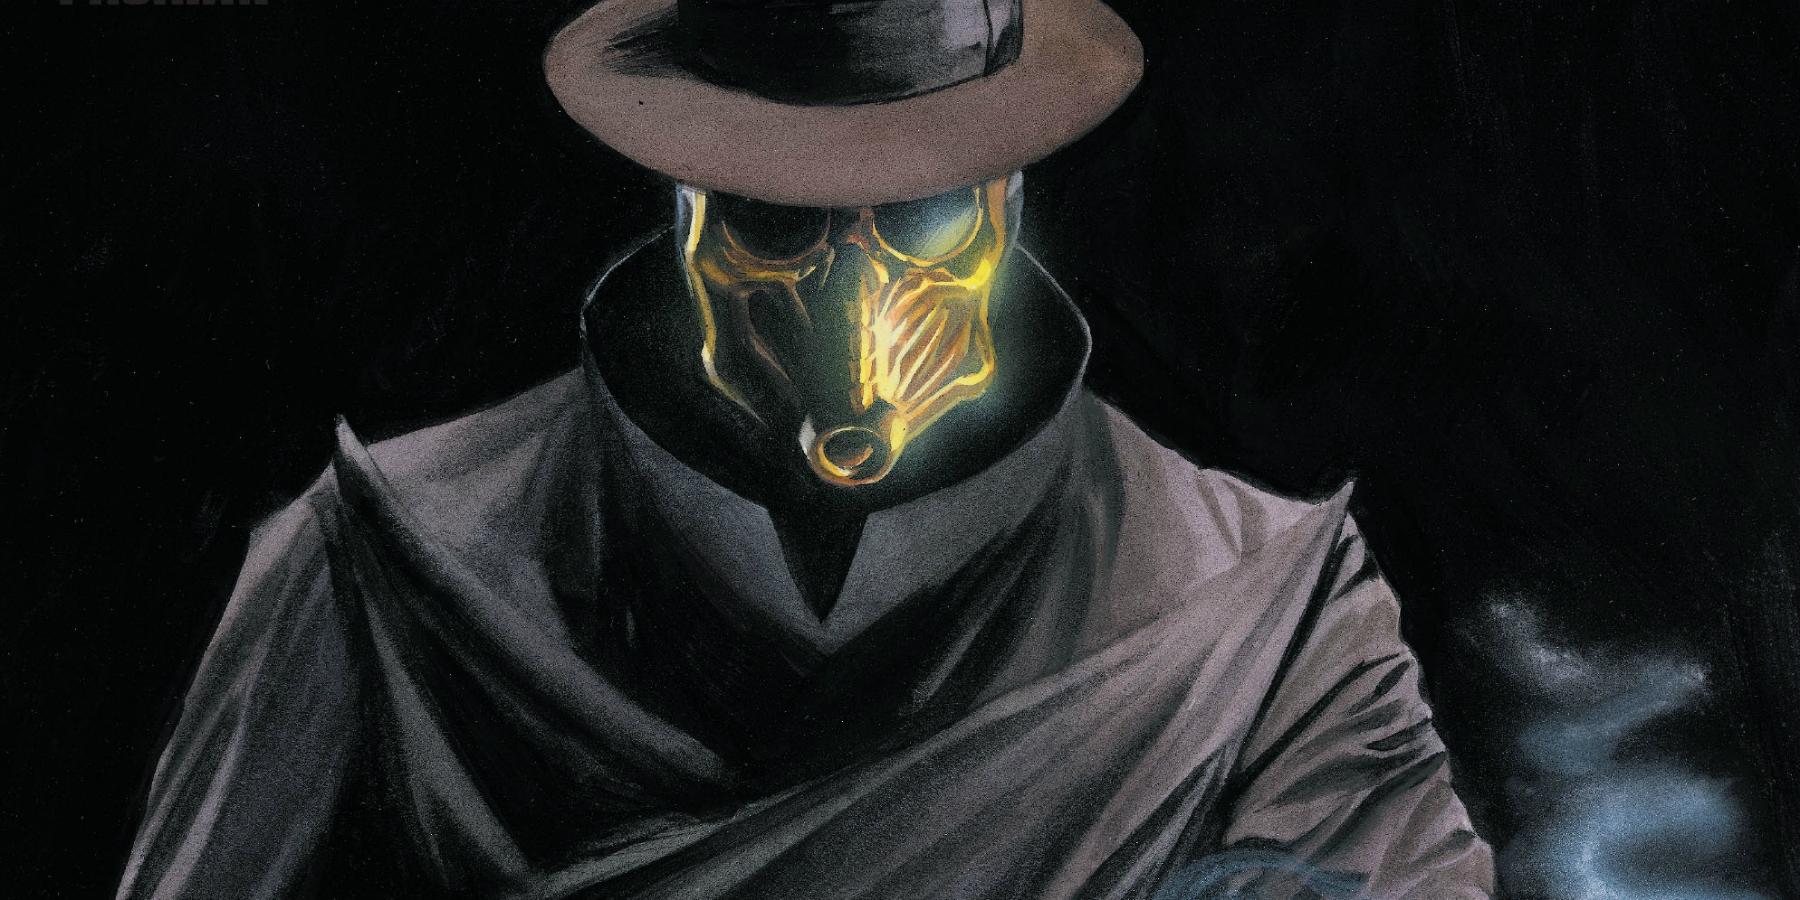 Sandy Hawkins as Sandman in DC Comics